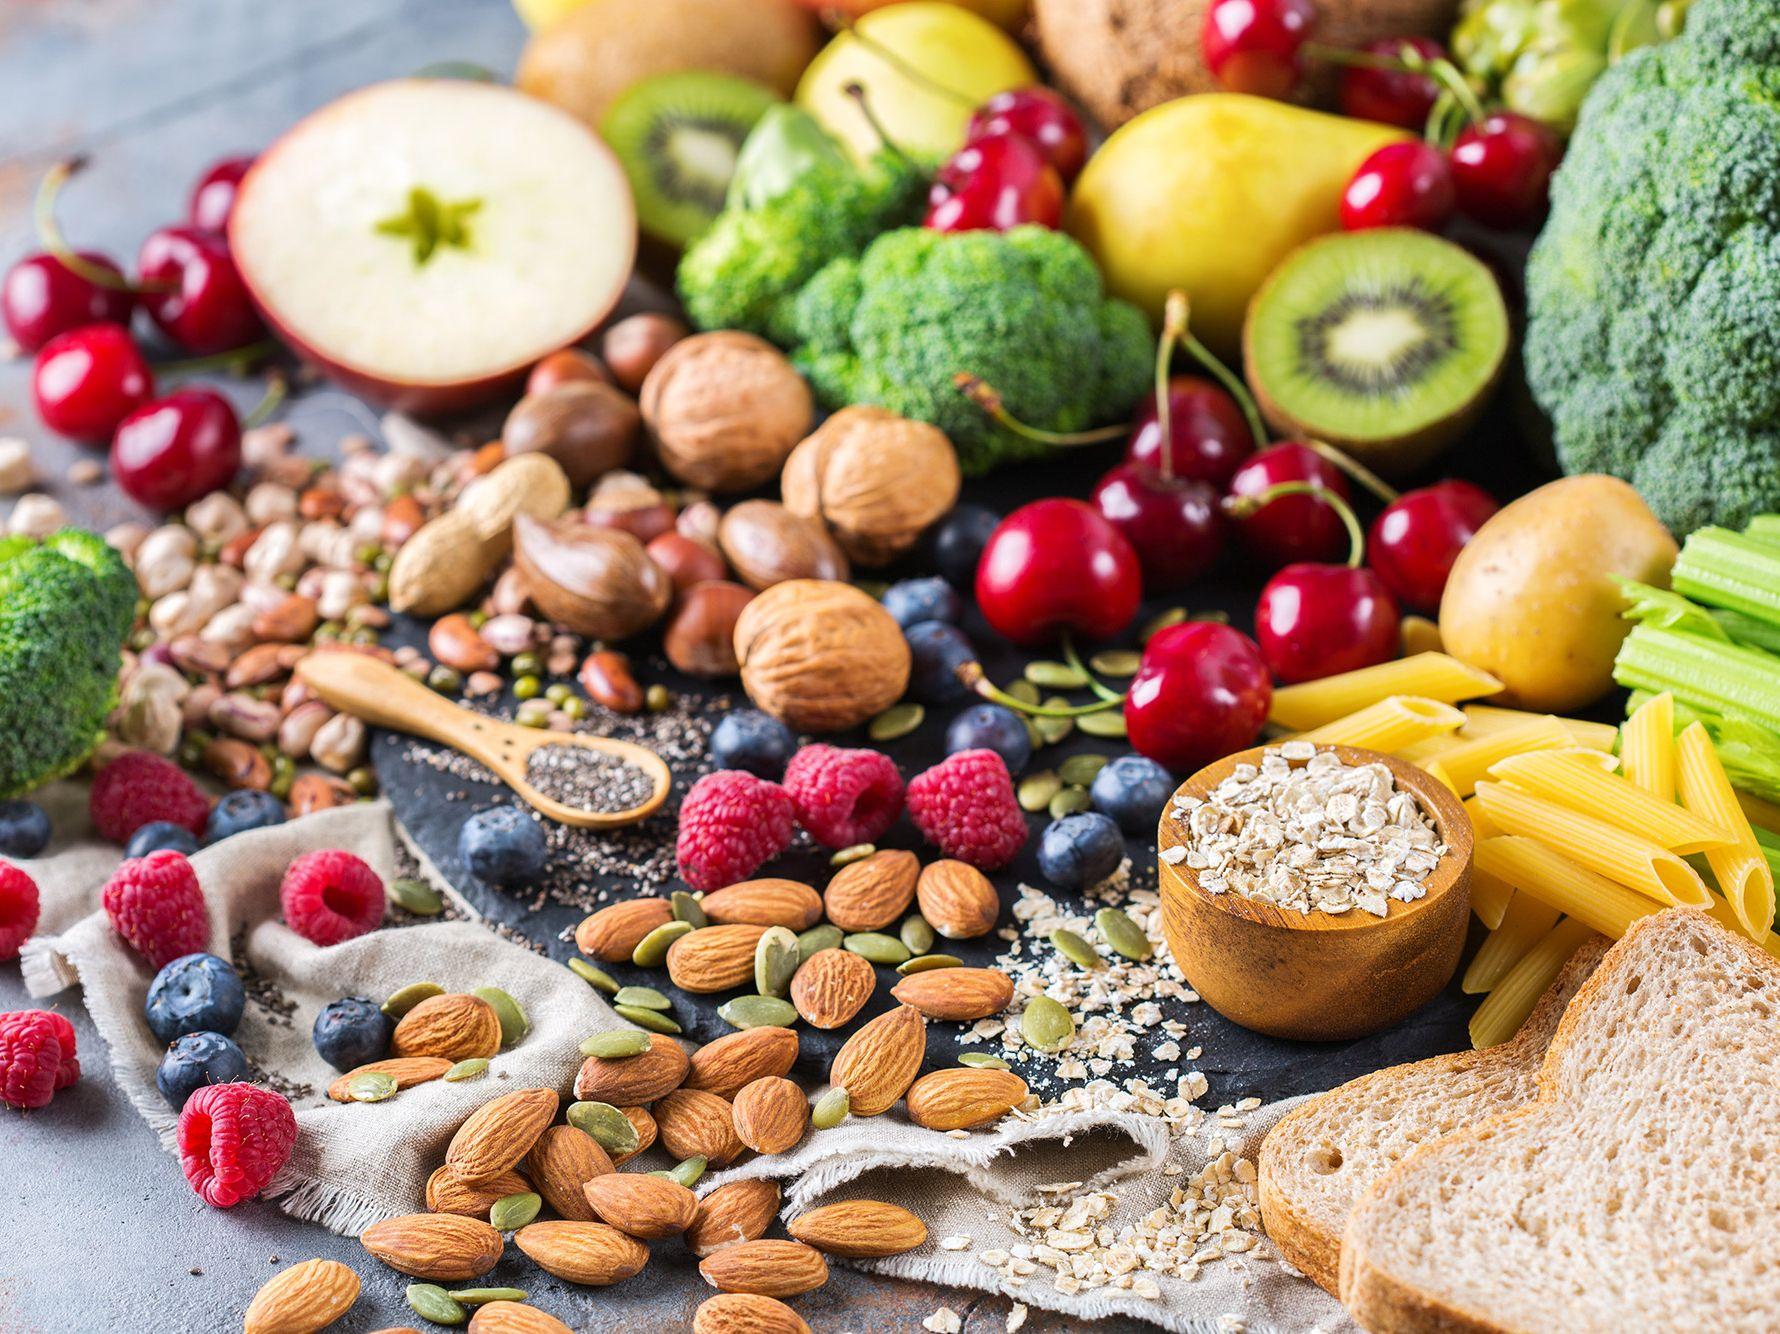 S prehrano do zdrave prebave